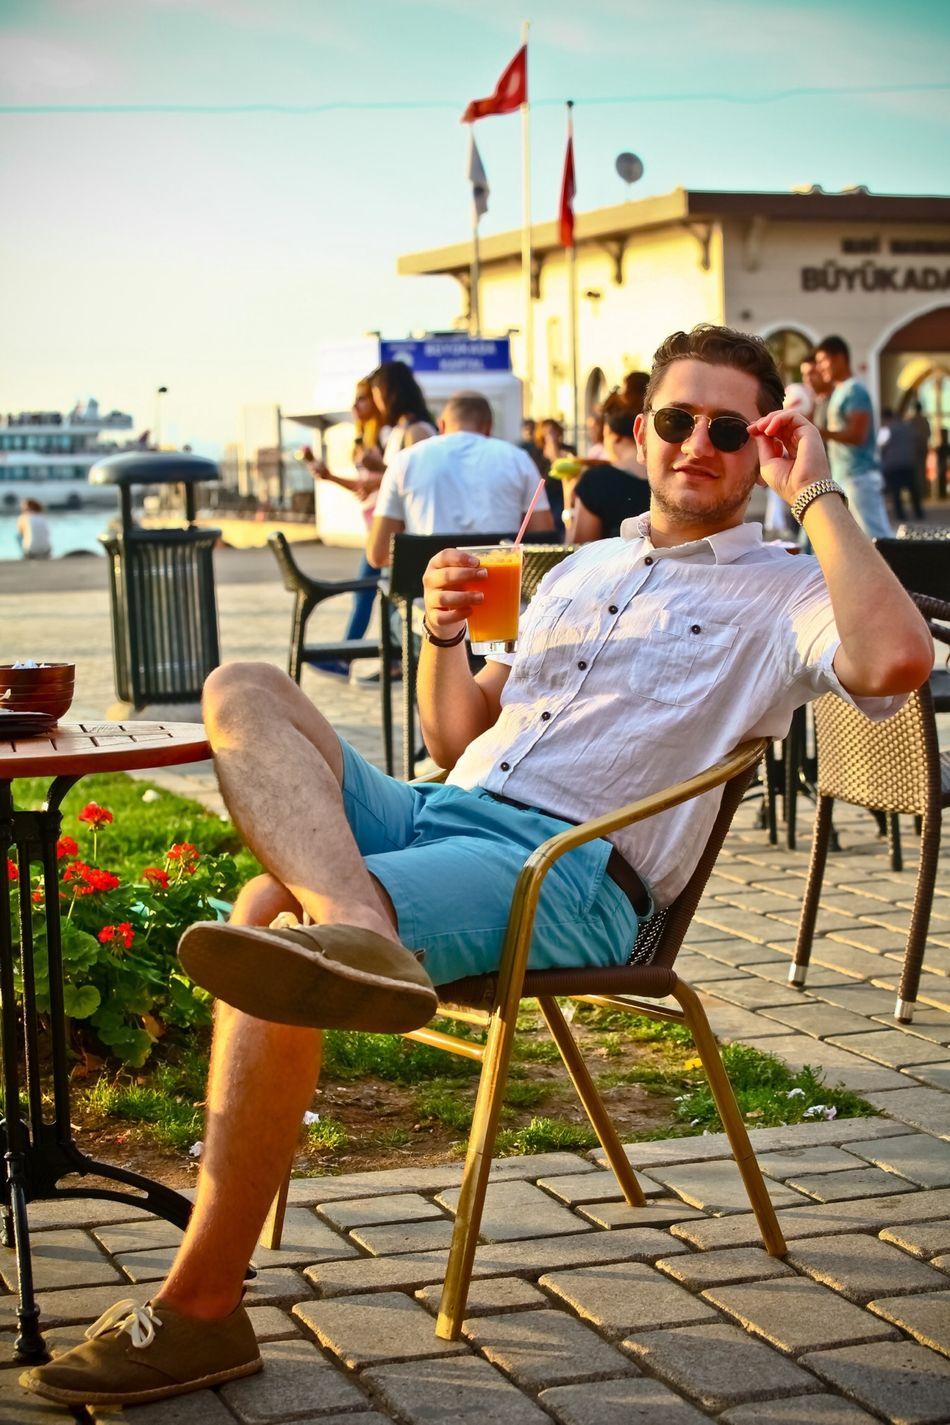 Enjoy Photography Relaxing Turkey